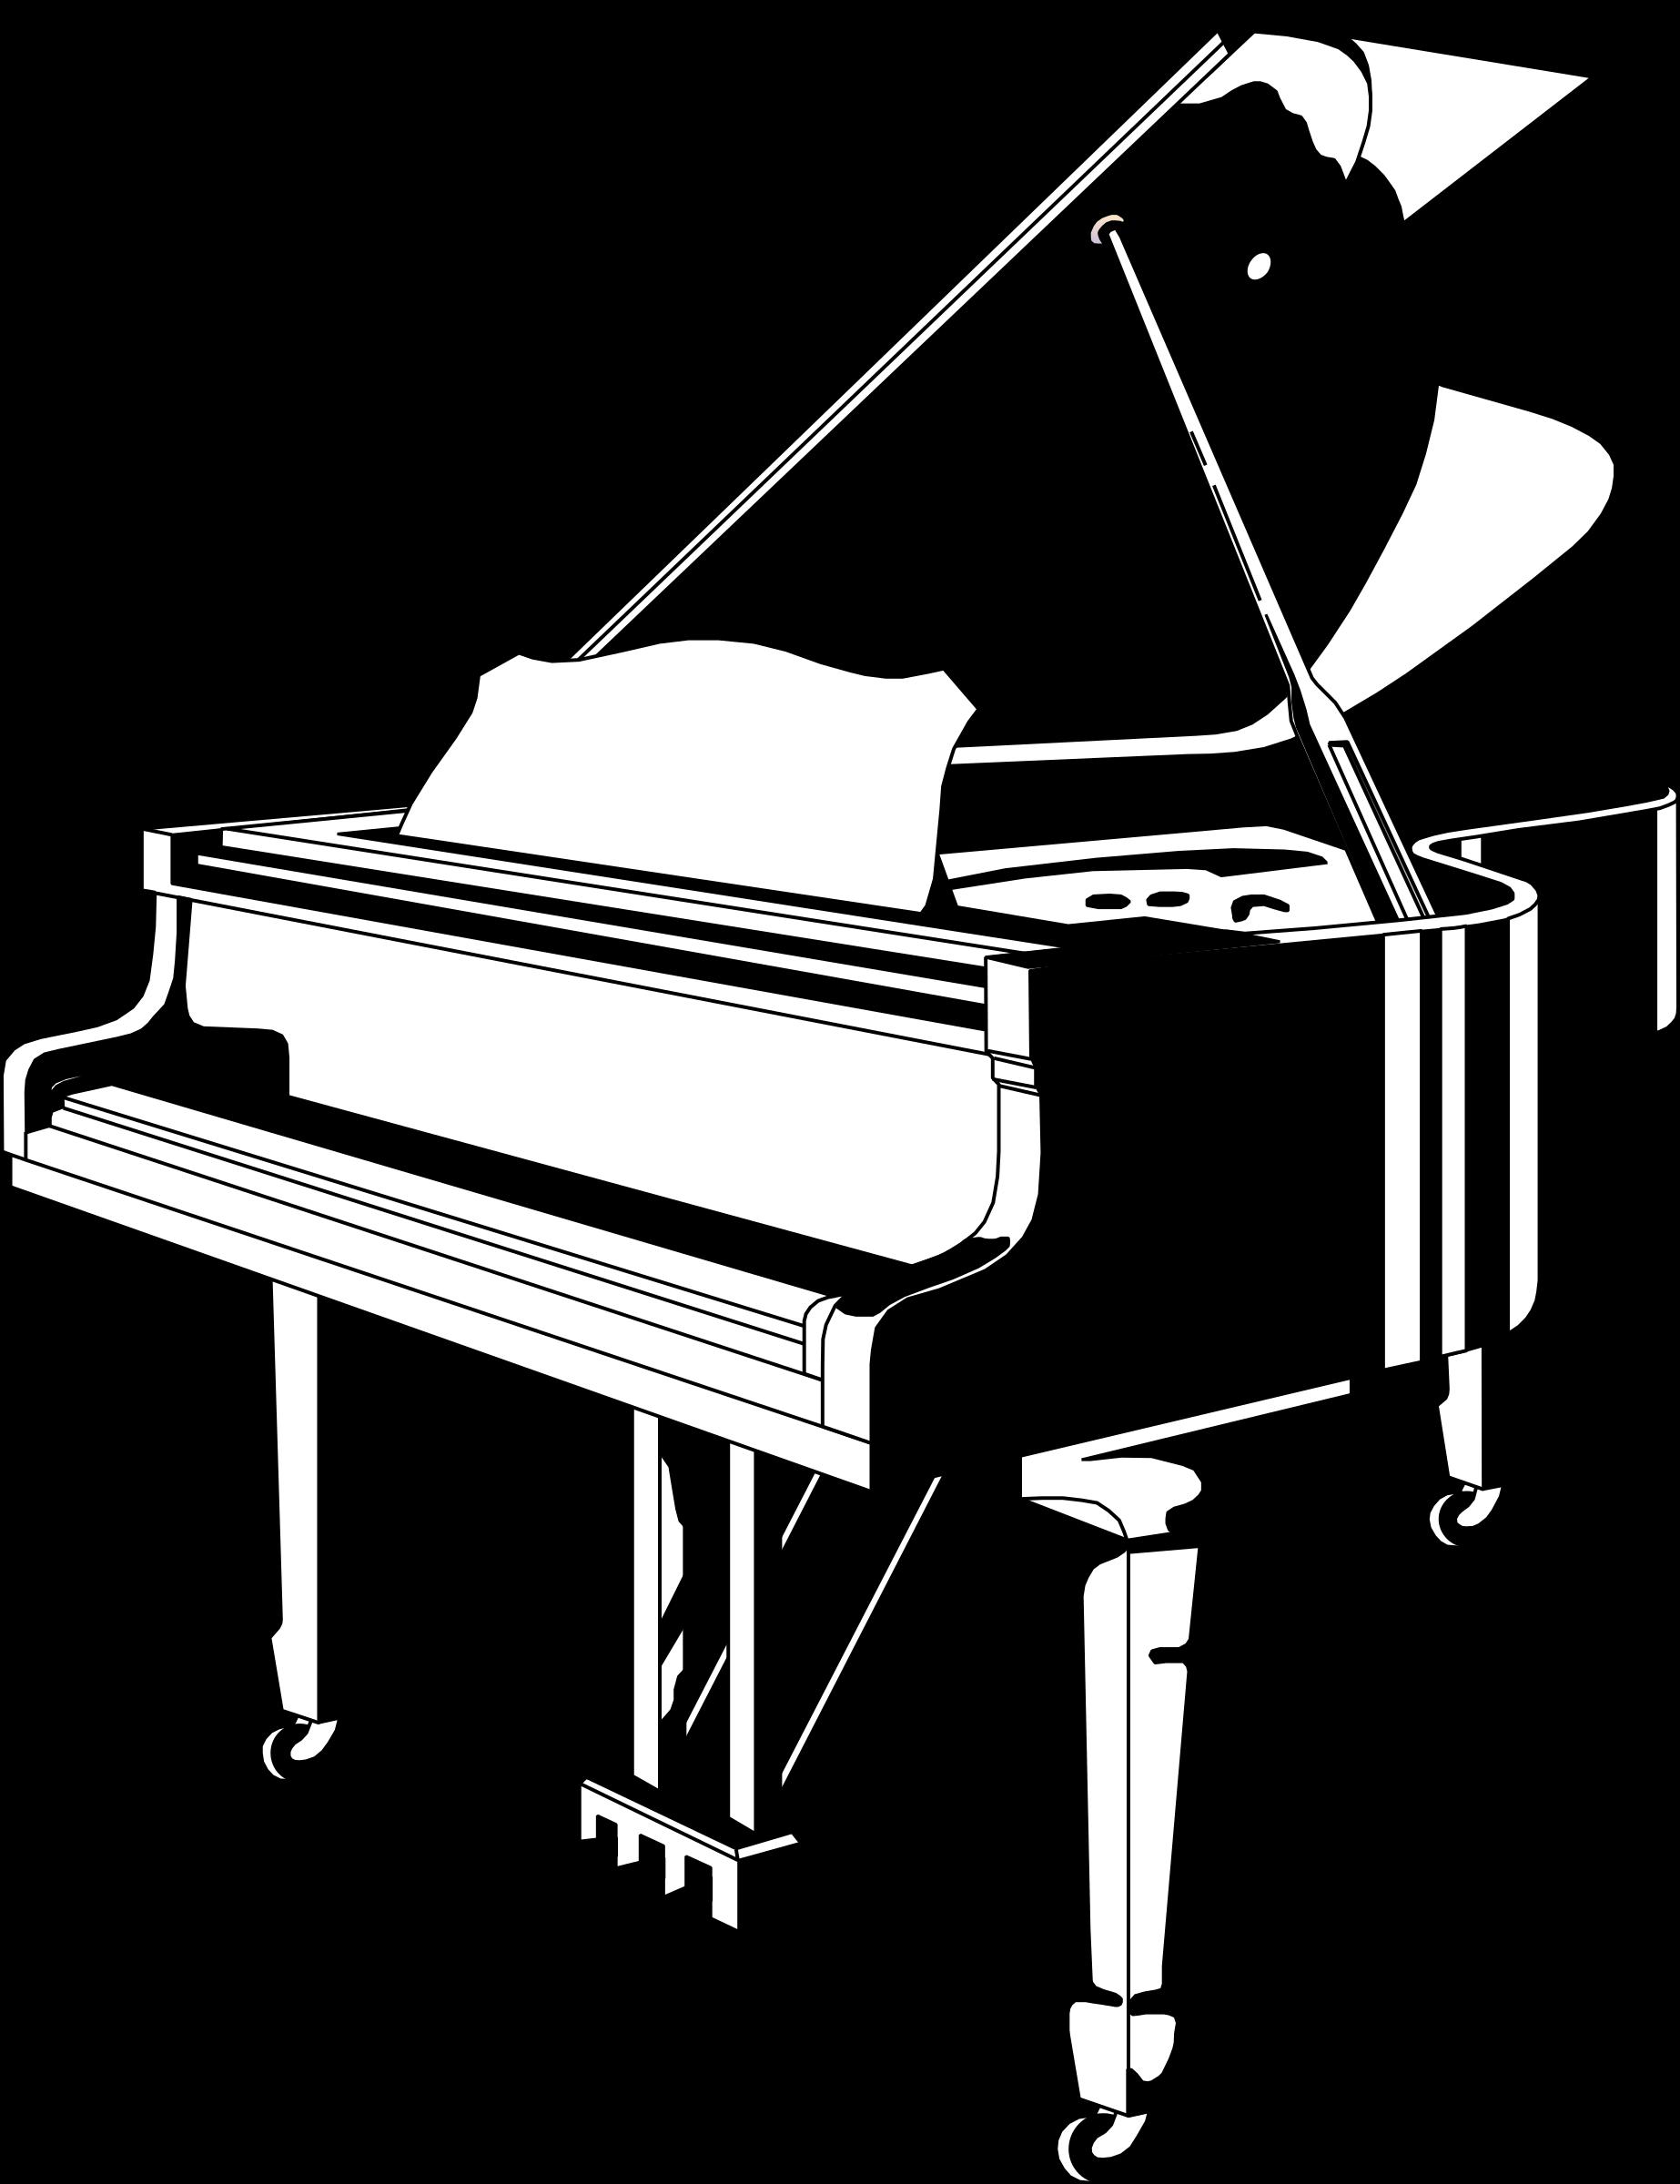 Black white big image. Piano clipart full keyboard